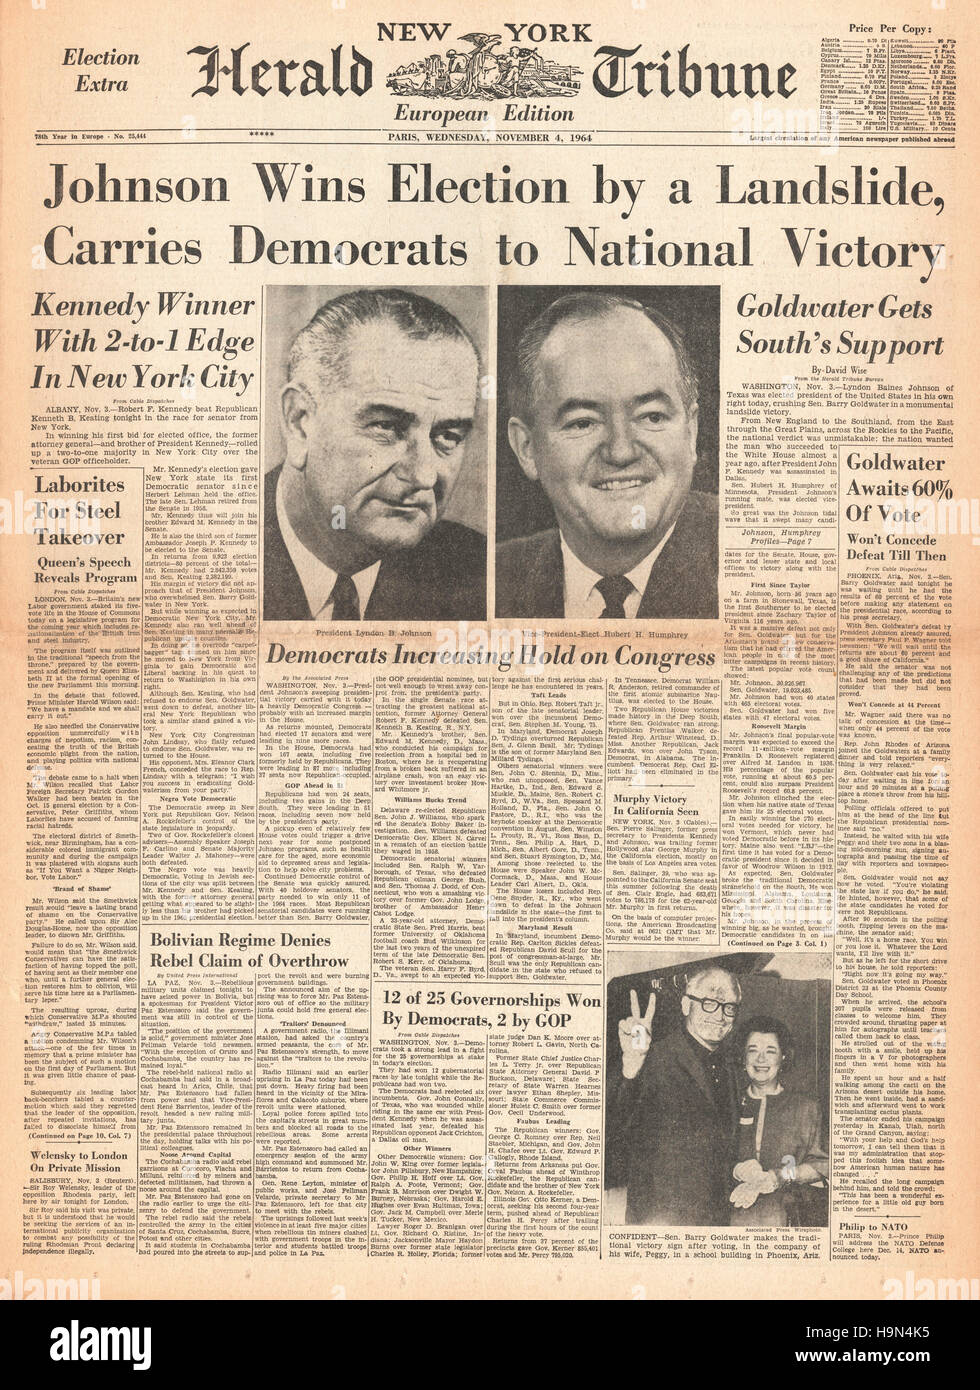 1964 New York Herald Tribune Lyndon B Johnson elected 36th President of the United States Stock Photo